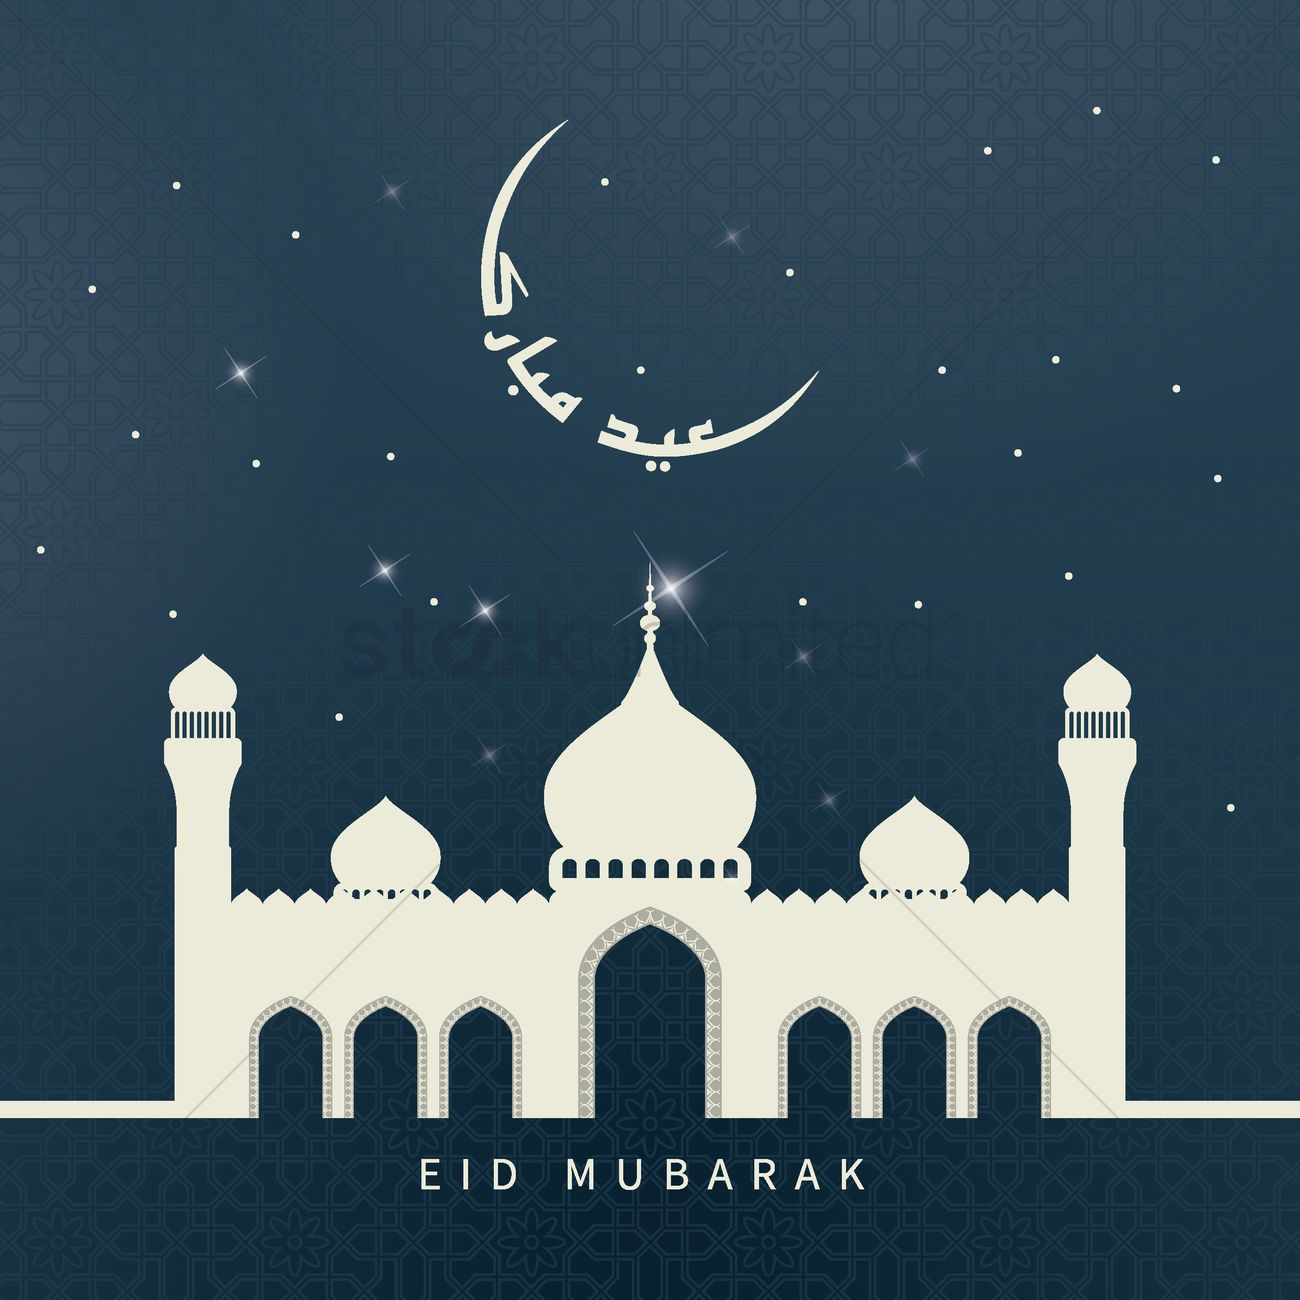 Eid Mubarak Greeting Vector Image 1828267 Stockunlimited